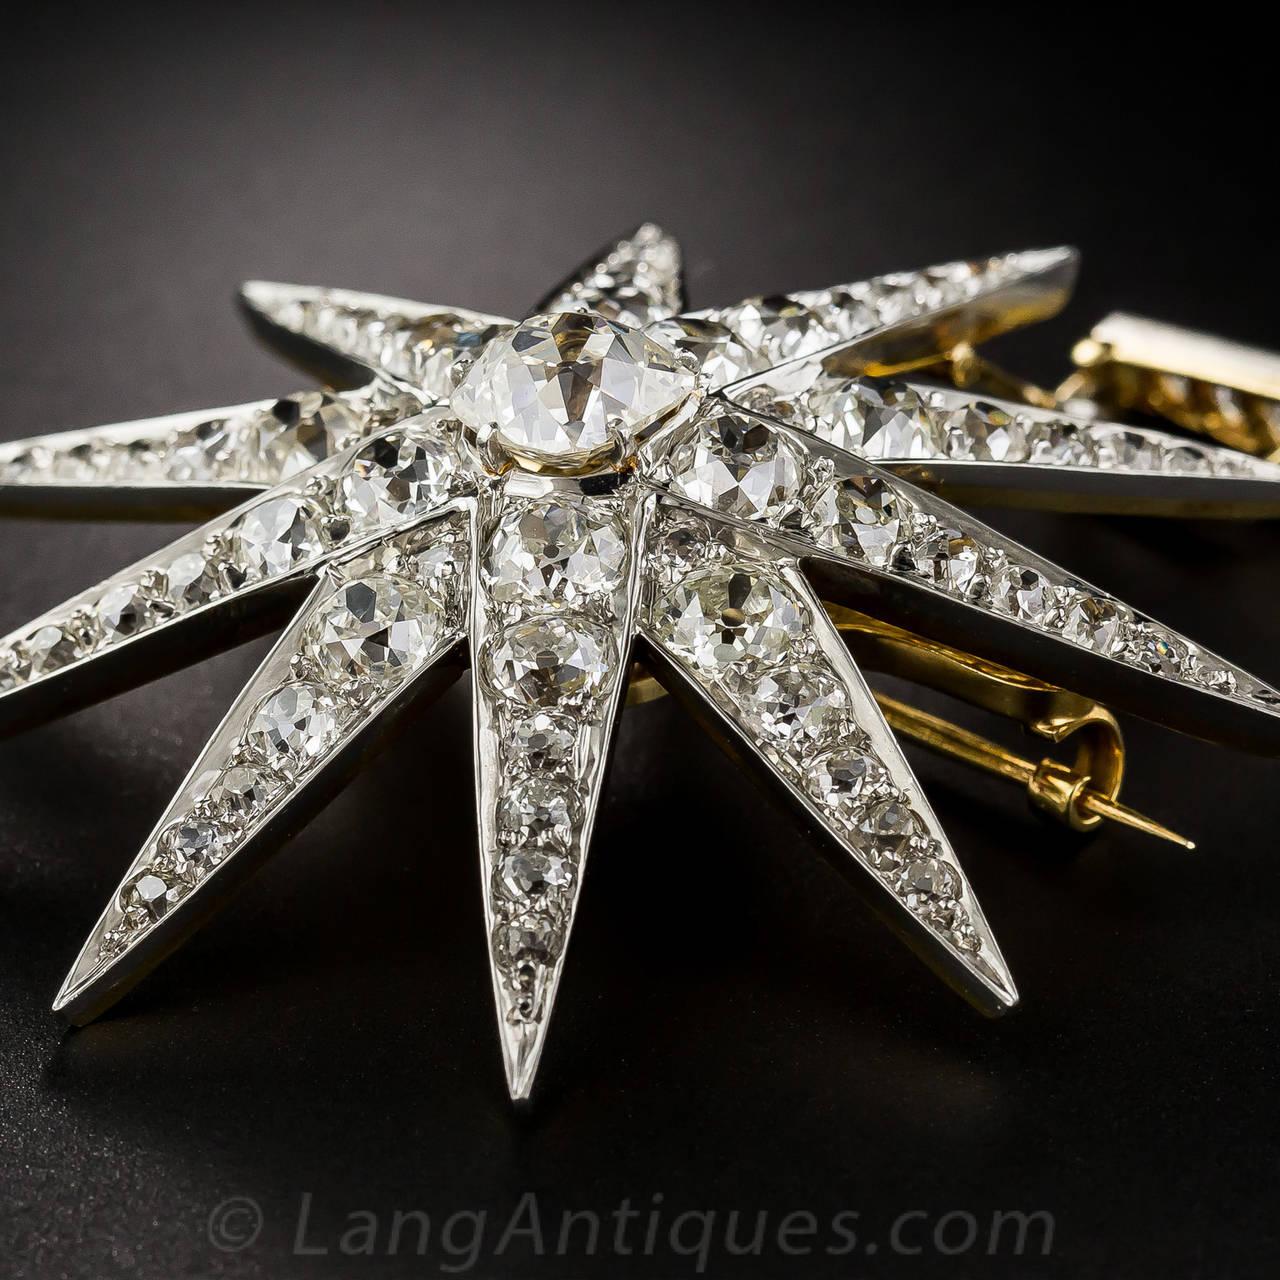 Victorian 2.13 Carat Cushion Cut Diamond Platinum Star Brooch Pendant - GIA Cert 7